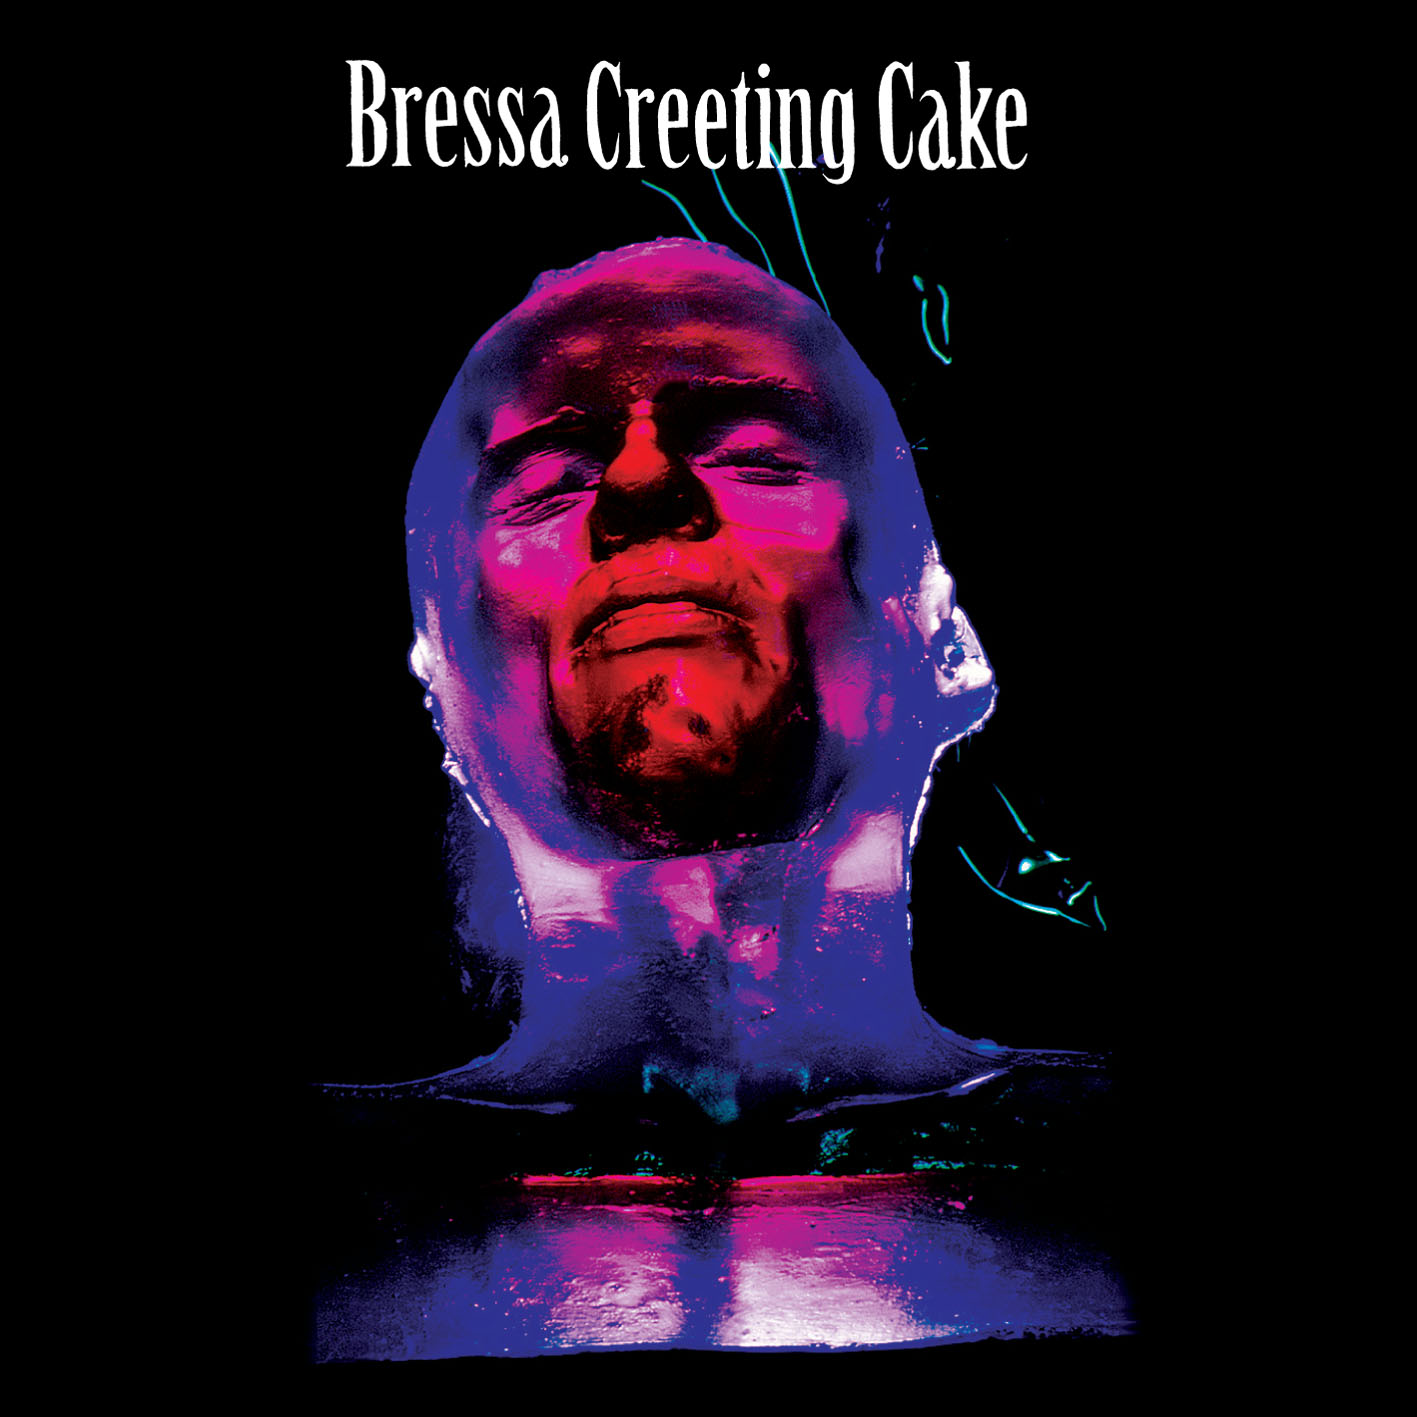 Bressa Creeting Cake - Bressa Creeting Cake - Album